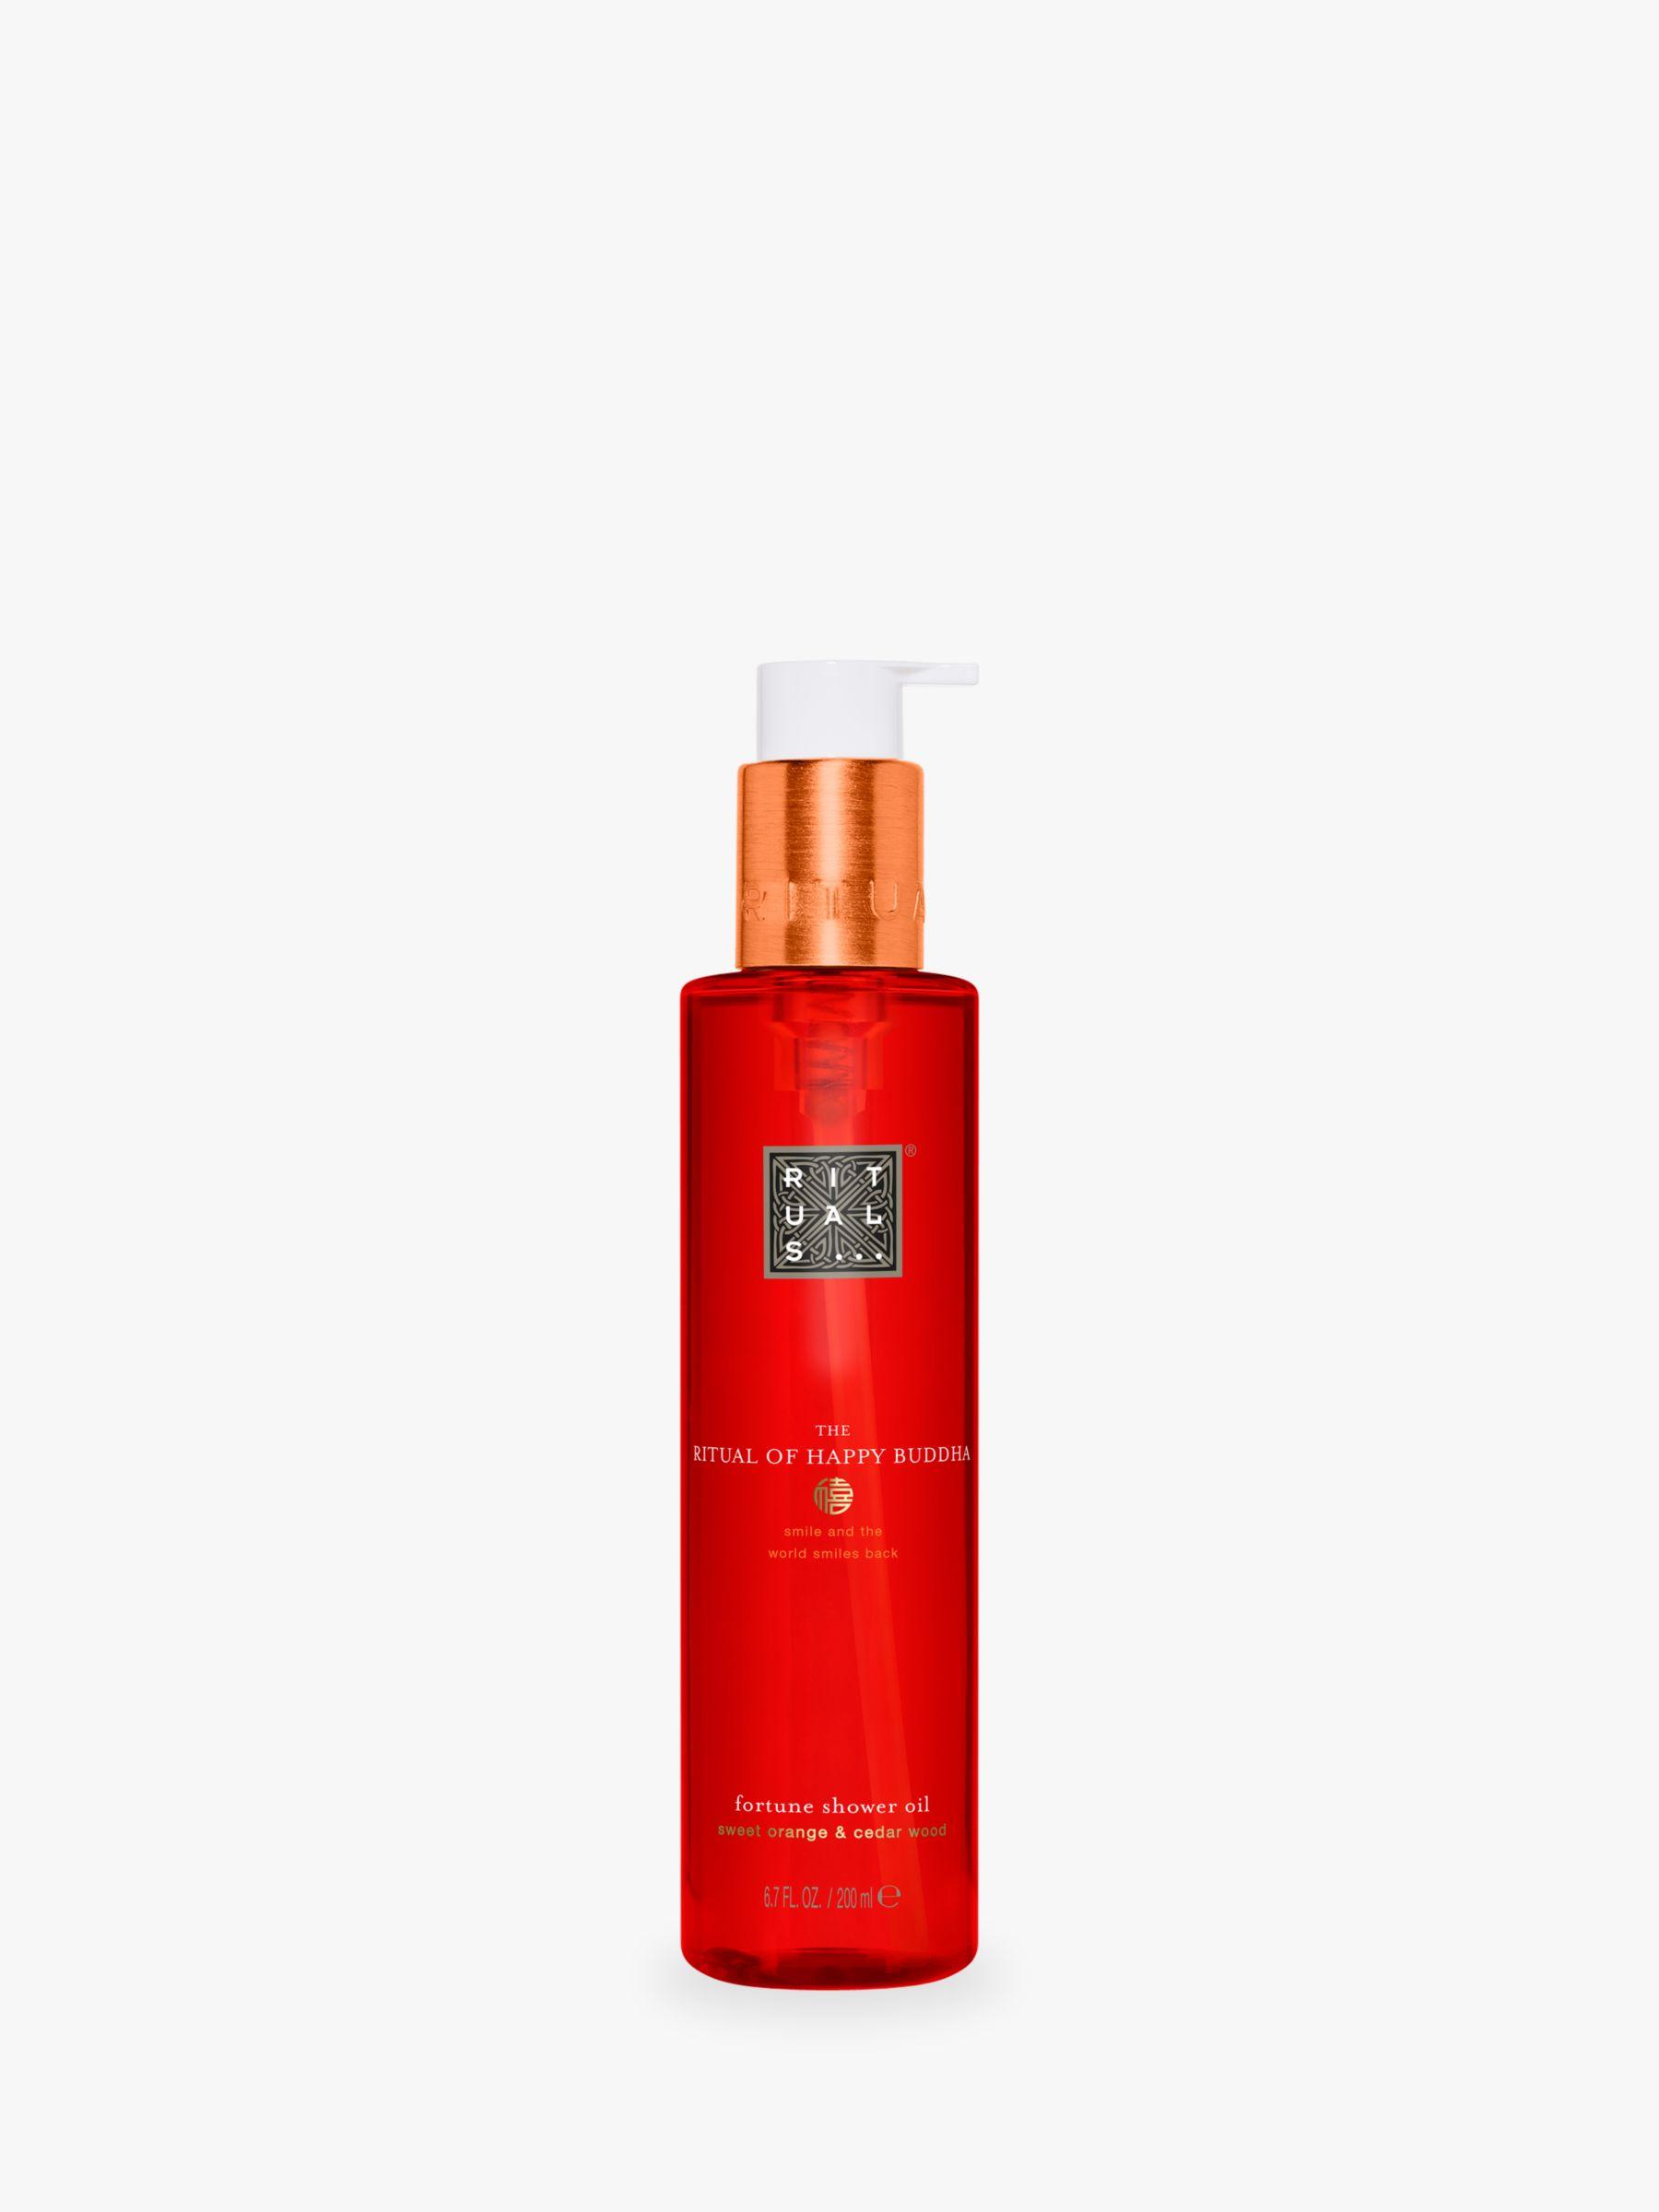 Rituals Rituals The Ritual of Happy Buddha Shower Oil, 200ml